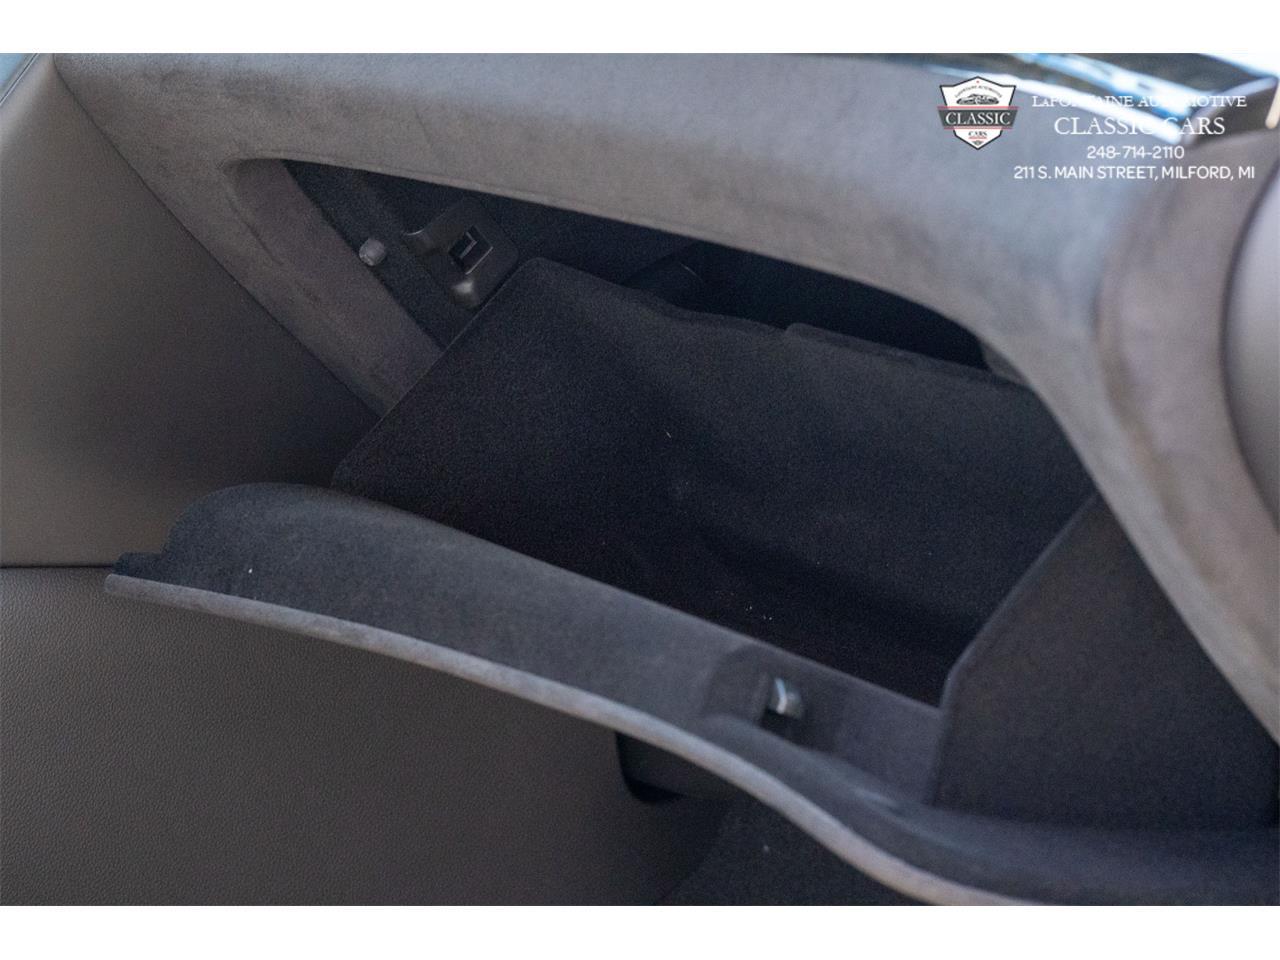 2019 Cadillac Escalade (CC-1418990) for sale in Milford, Michigan